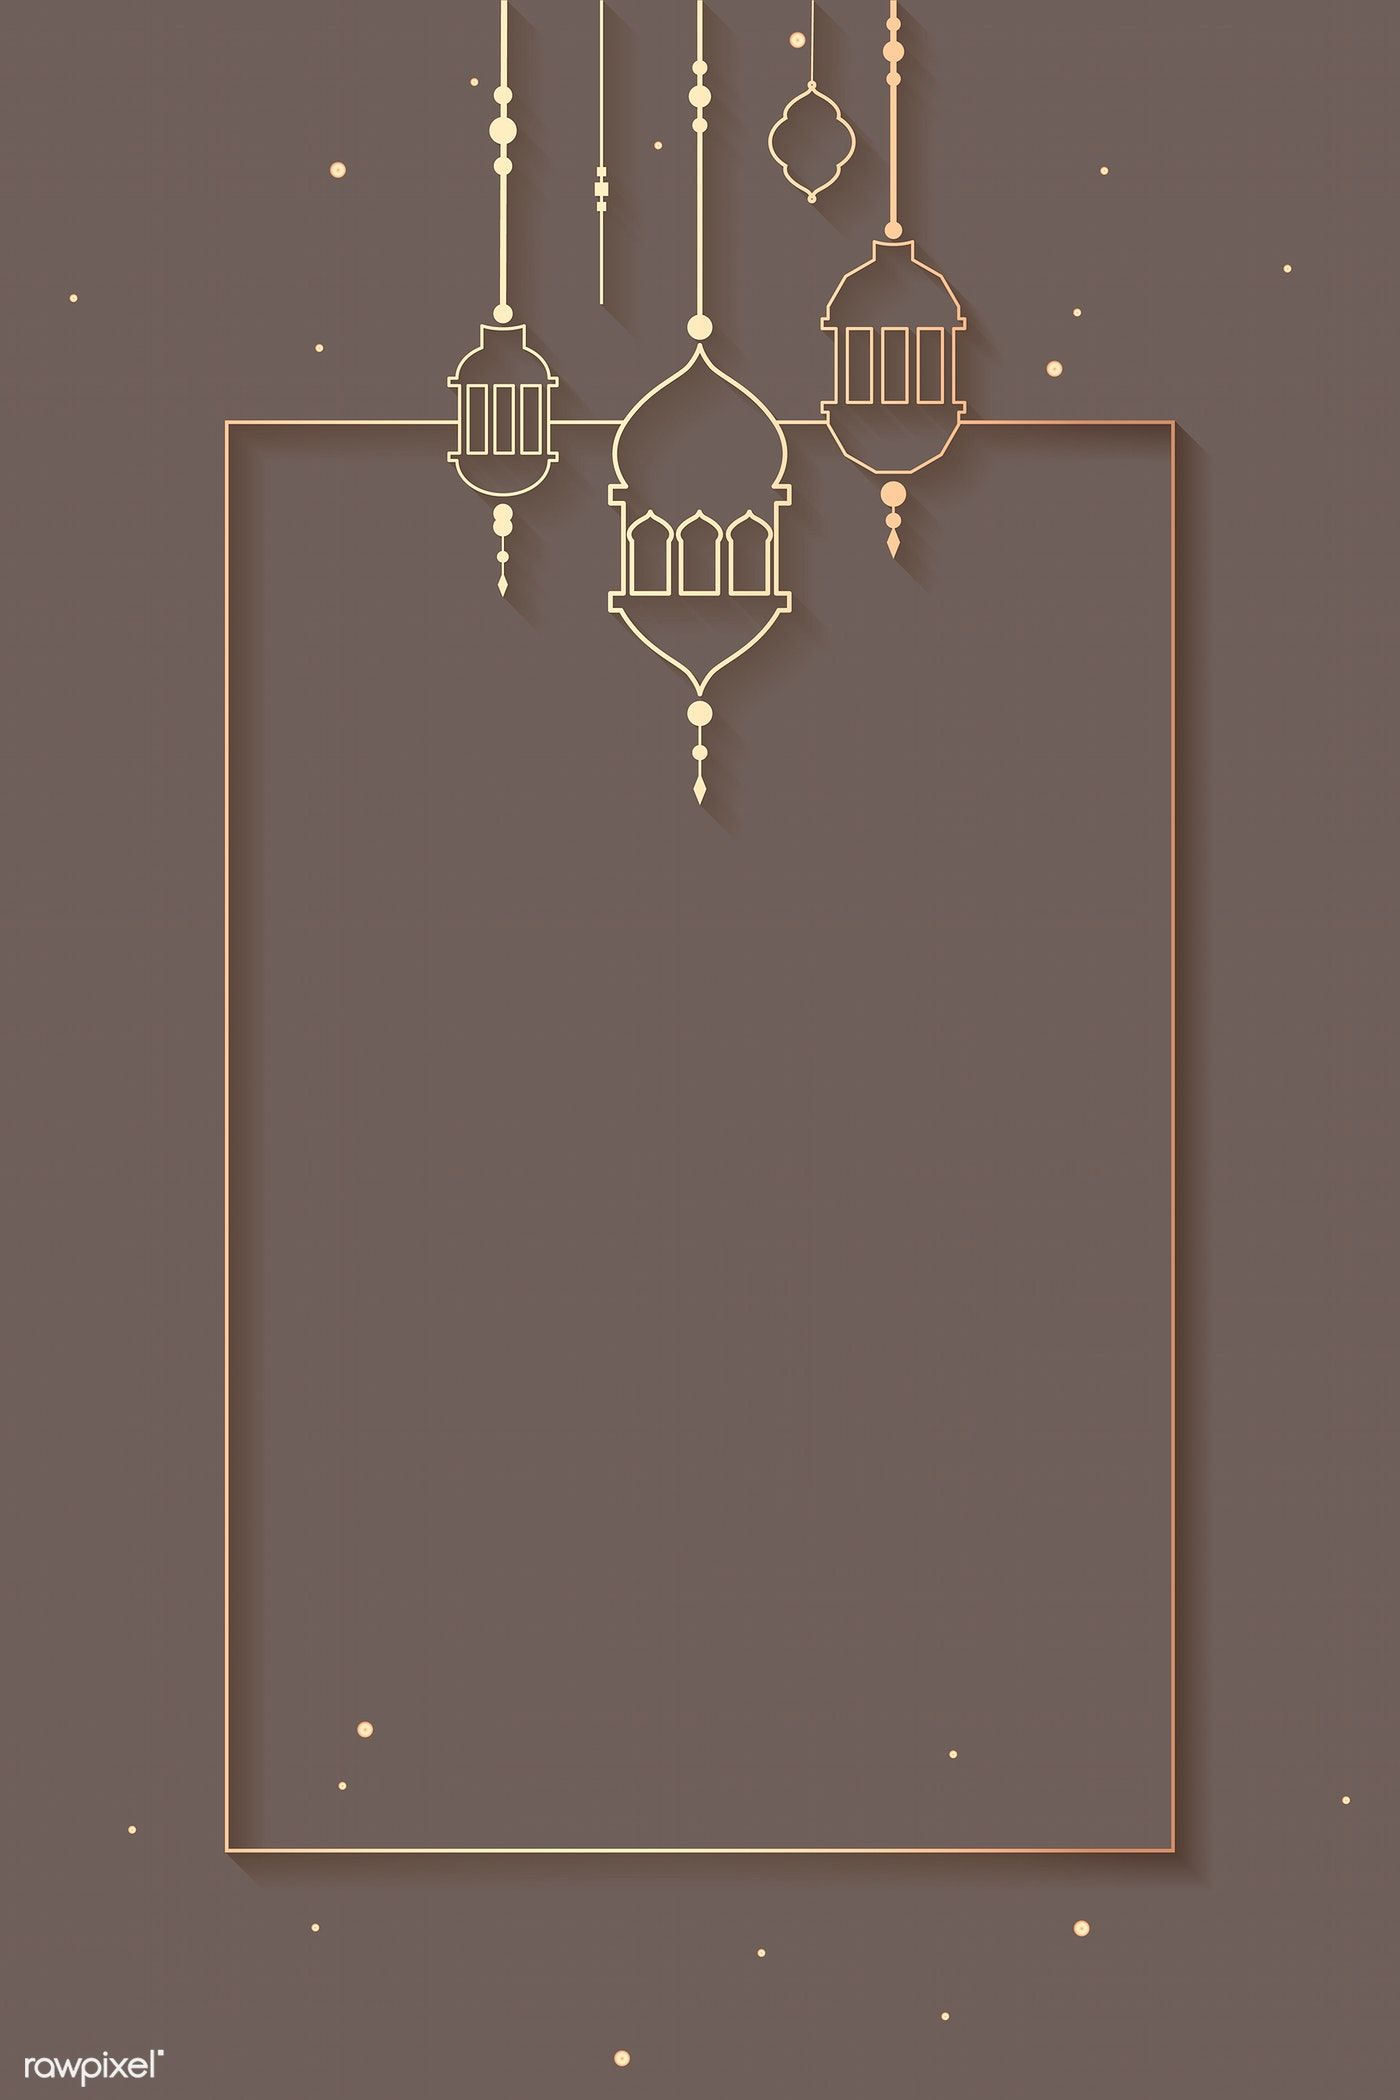 Download Premium Vector Of Ramadan Mubarak Frame With Lantern Vector 868583 Background Design Poster Background Design Ramadan Background